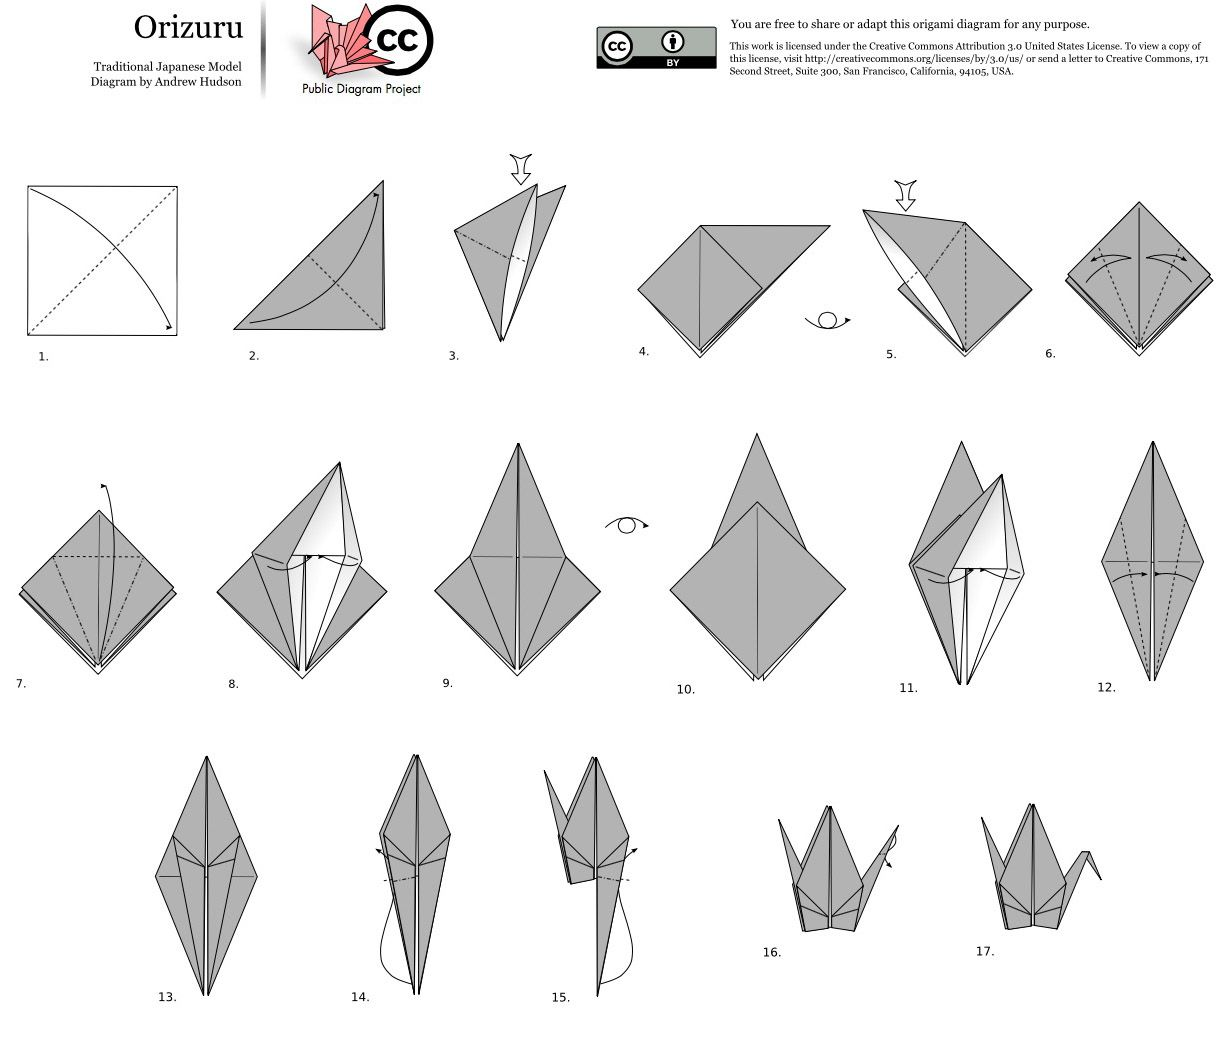 Fold Orizuru Paper Cranes for Hiroshima Day August 6th